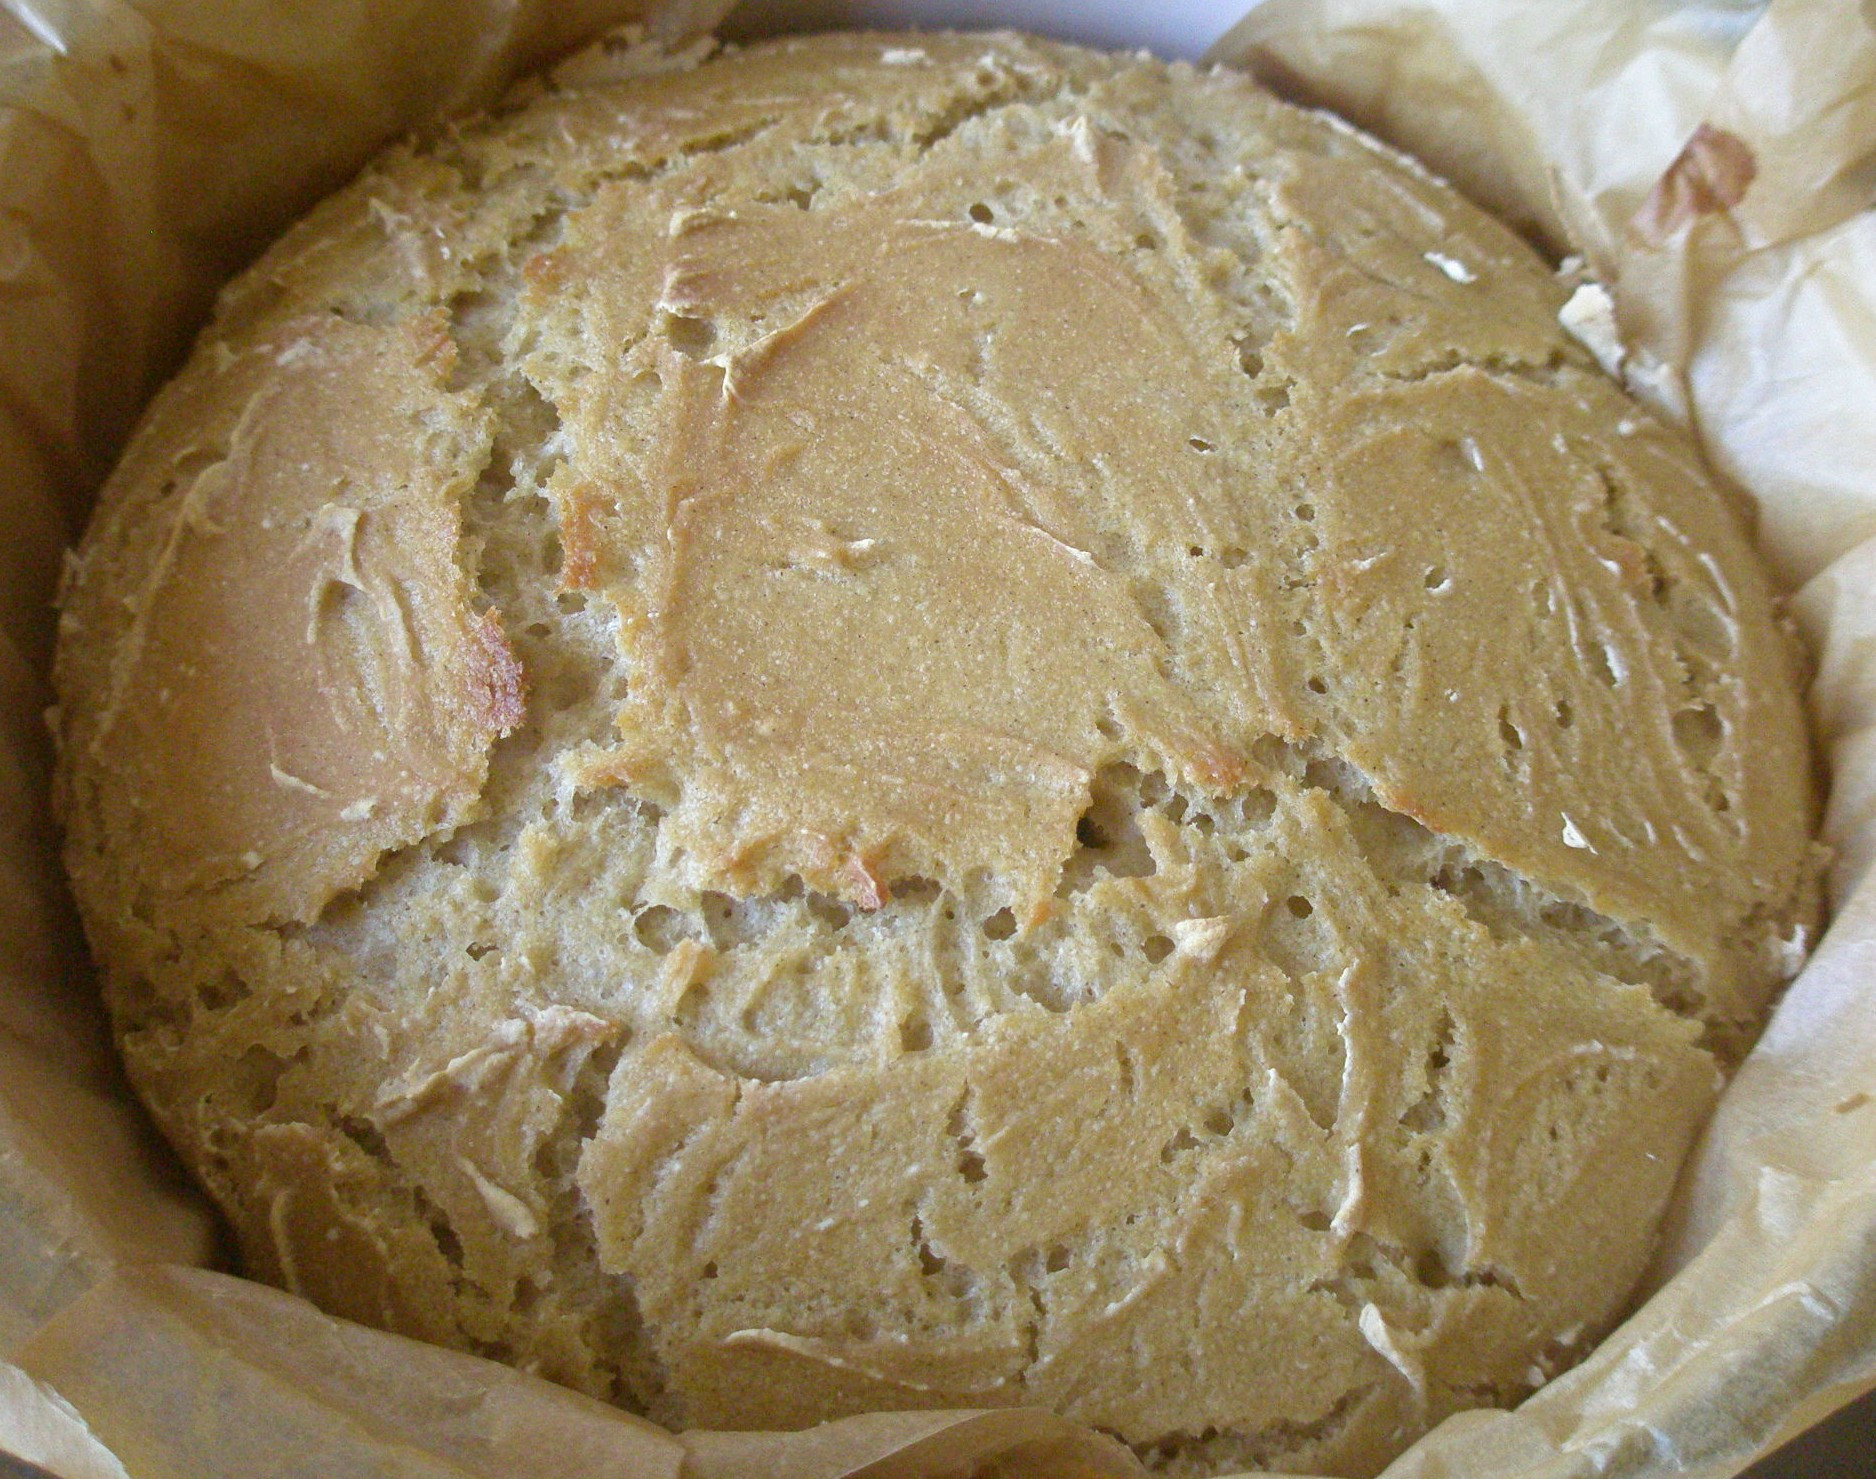 Gluten Free Sourdough Bread Recipe  Sourdough Bread Boule Gluten Free Art of Gluten Free